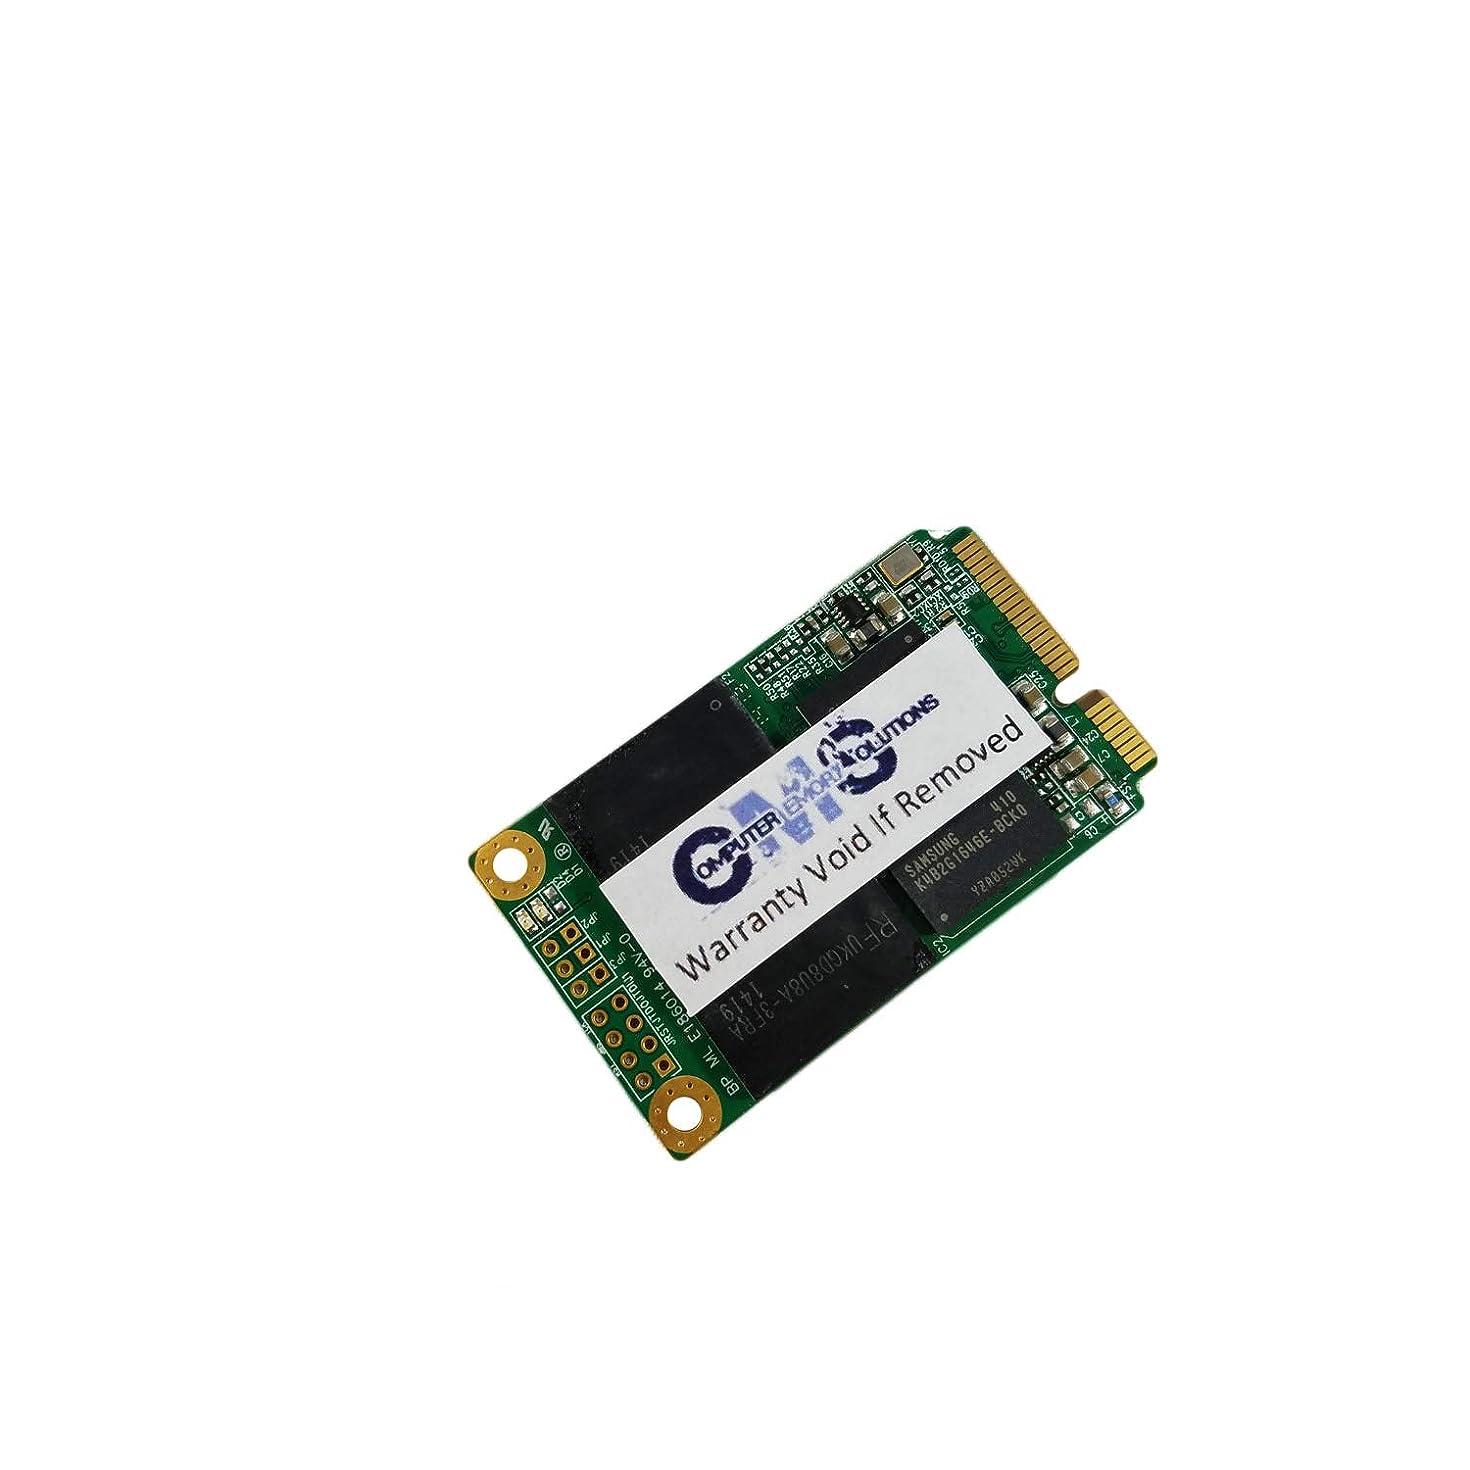 128GB m-SATA SSD DRIVE SATA III 6GB/s aq Compatible with Lenovo IdeaPad Yoga 11s, Yoga 13 BY CMS C29